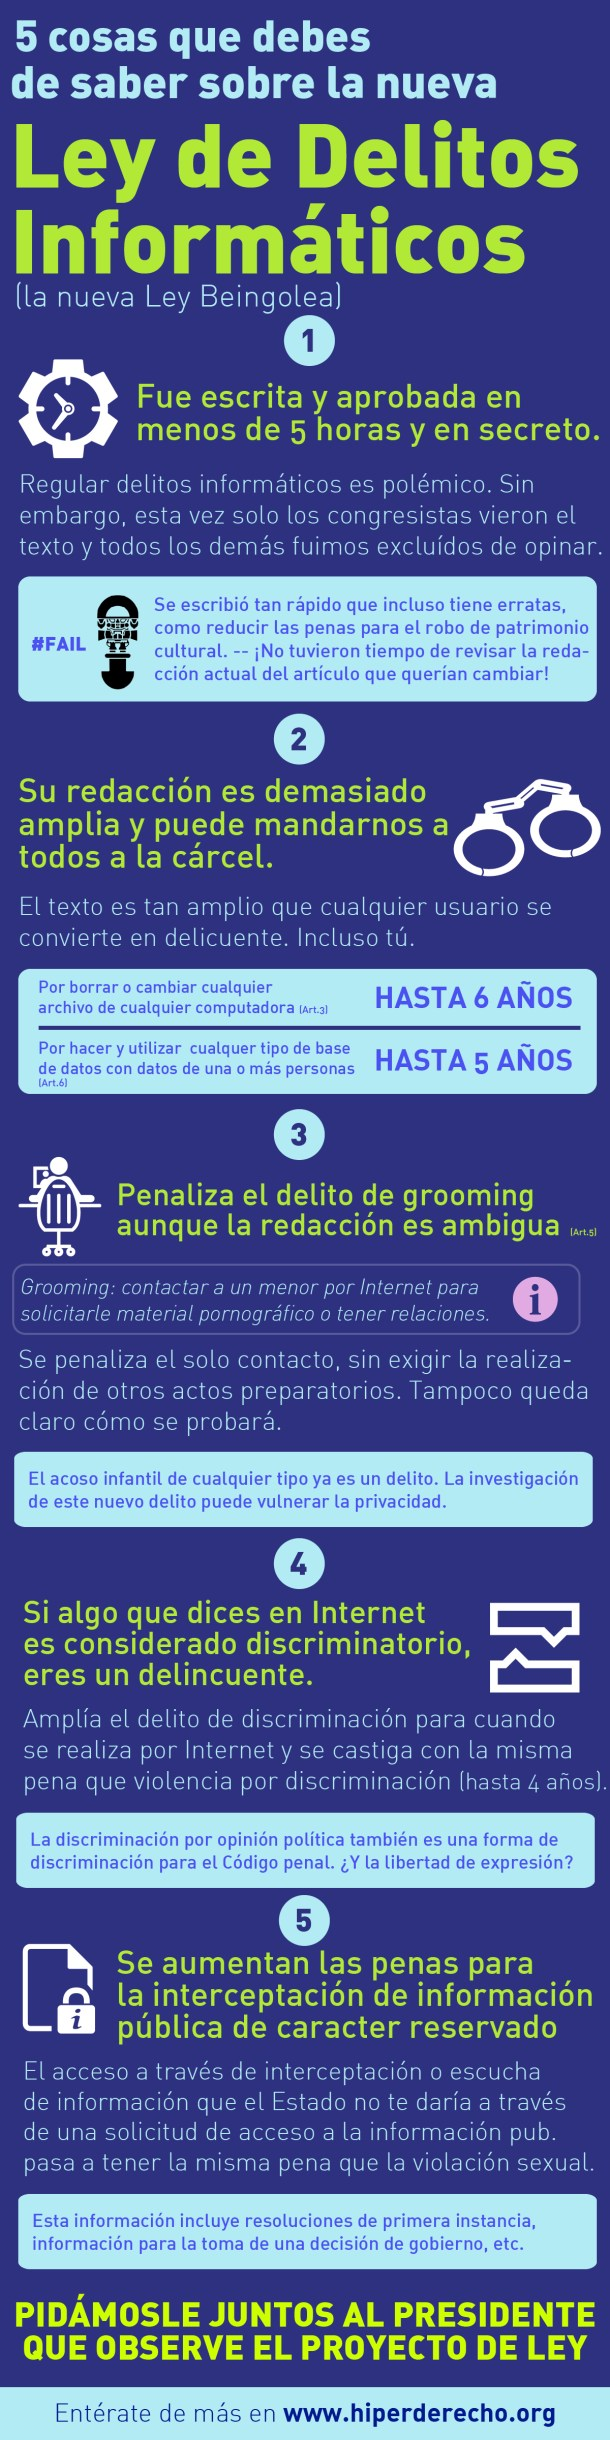 infografia-ley-beingolea